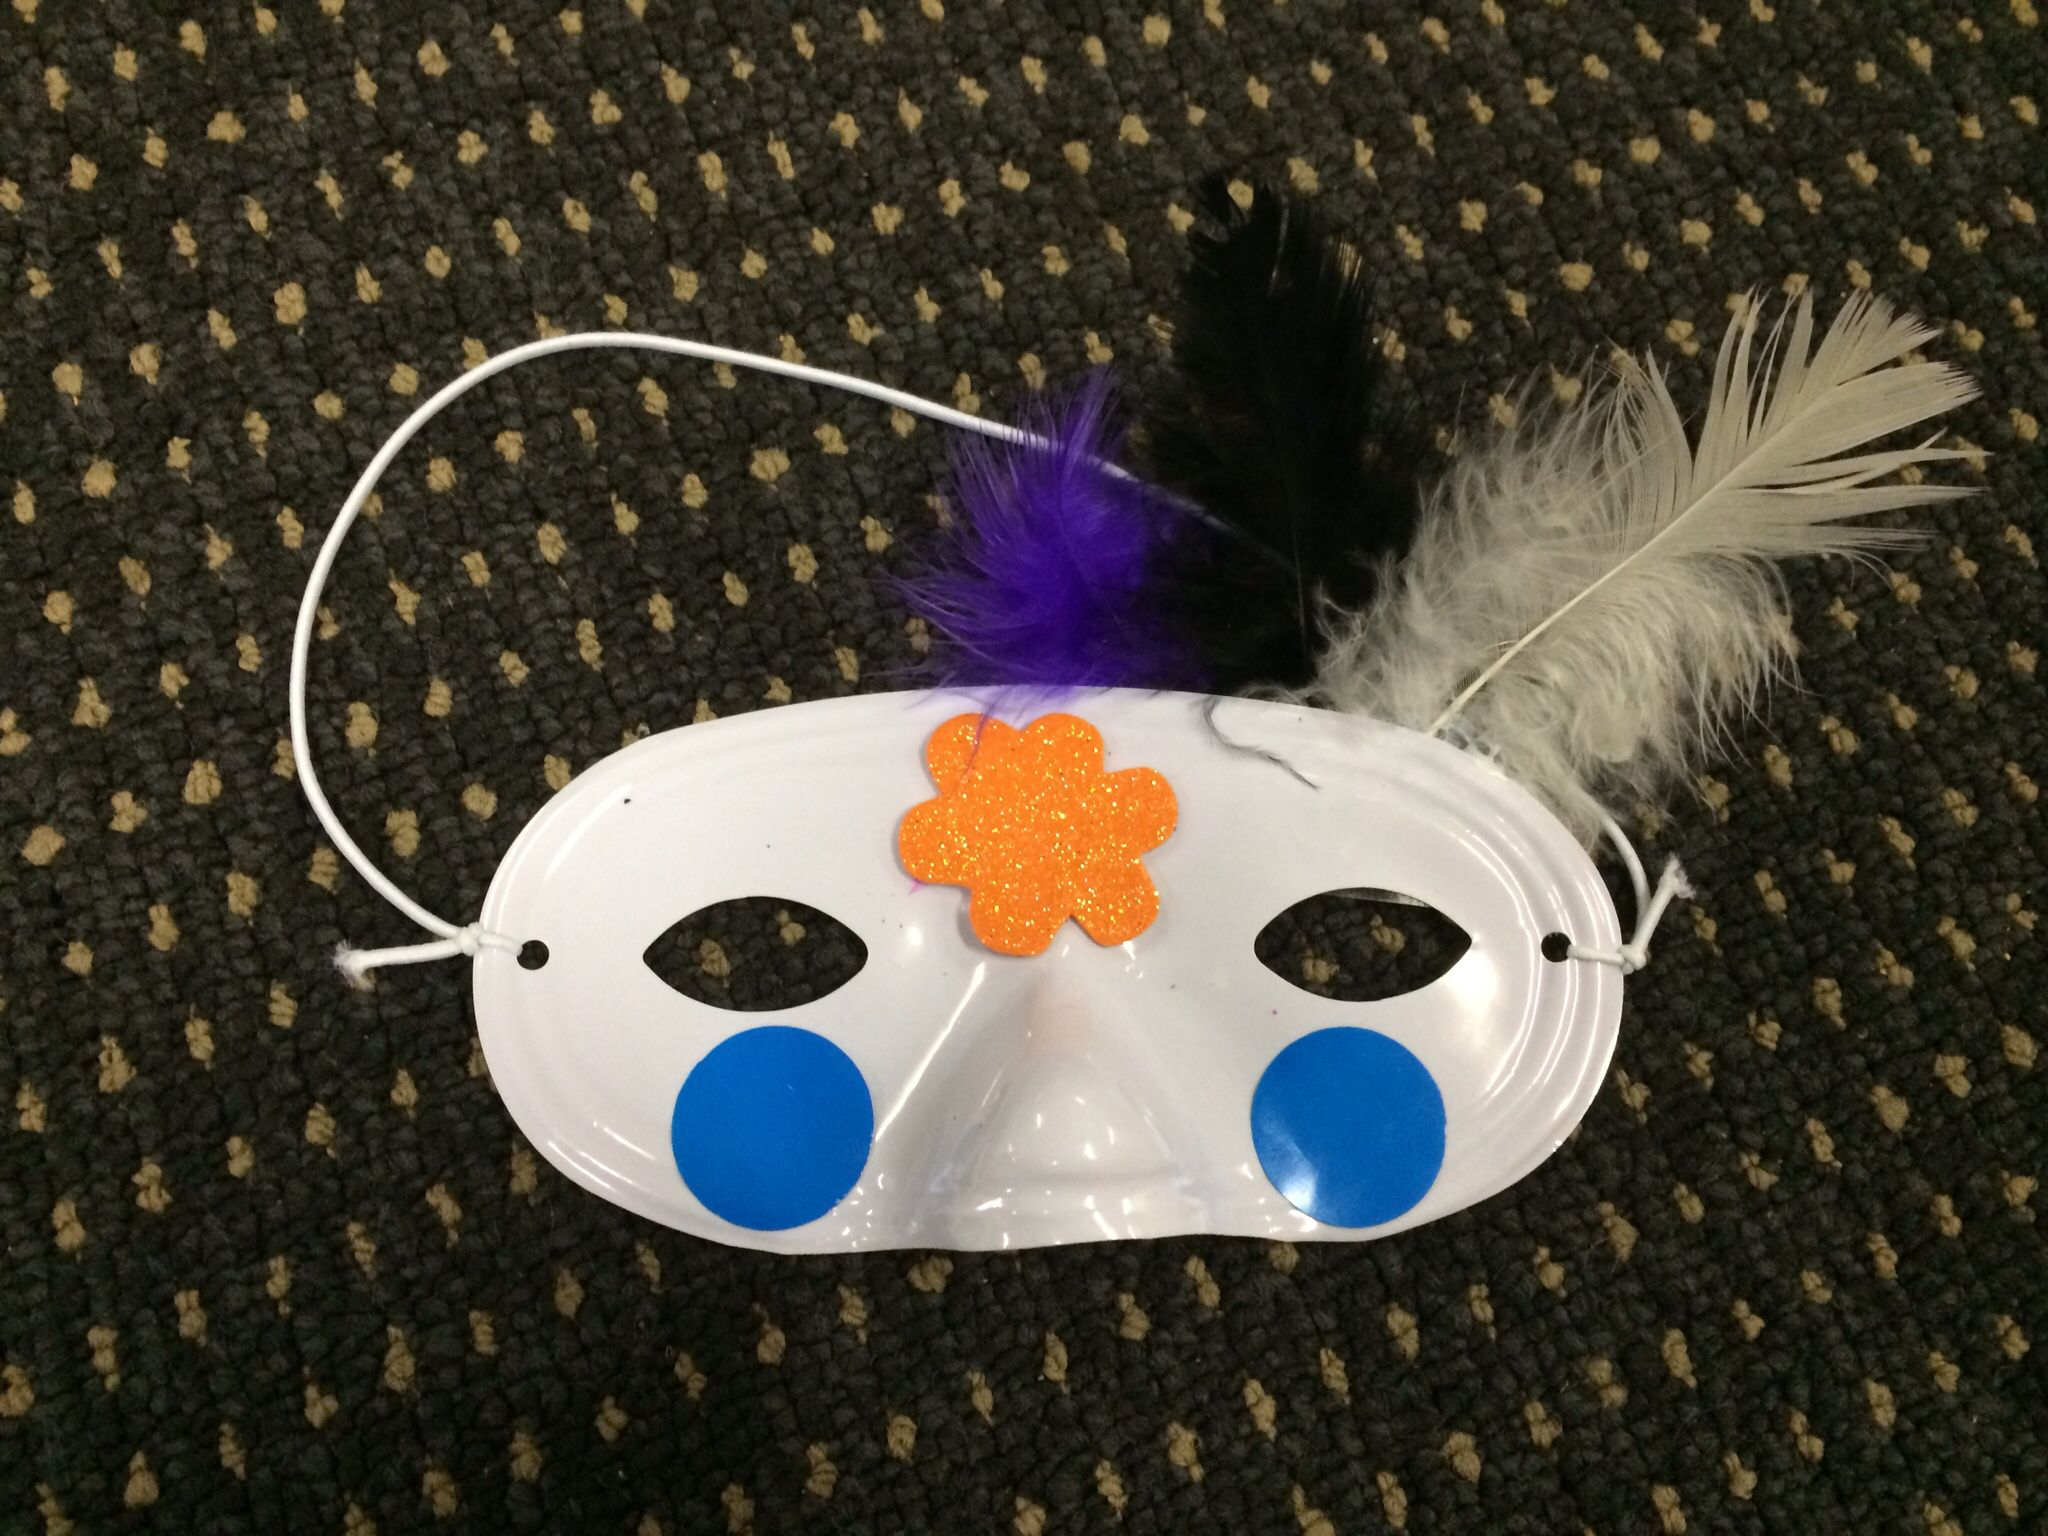 Superhero Masks To Decorate Superhero Playgroup Craft Madedecorating Masks With Stickers